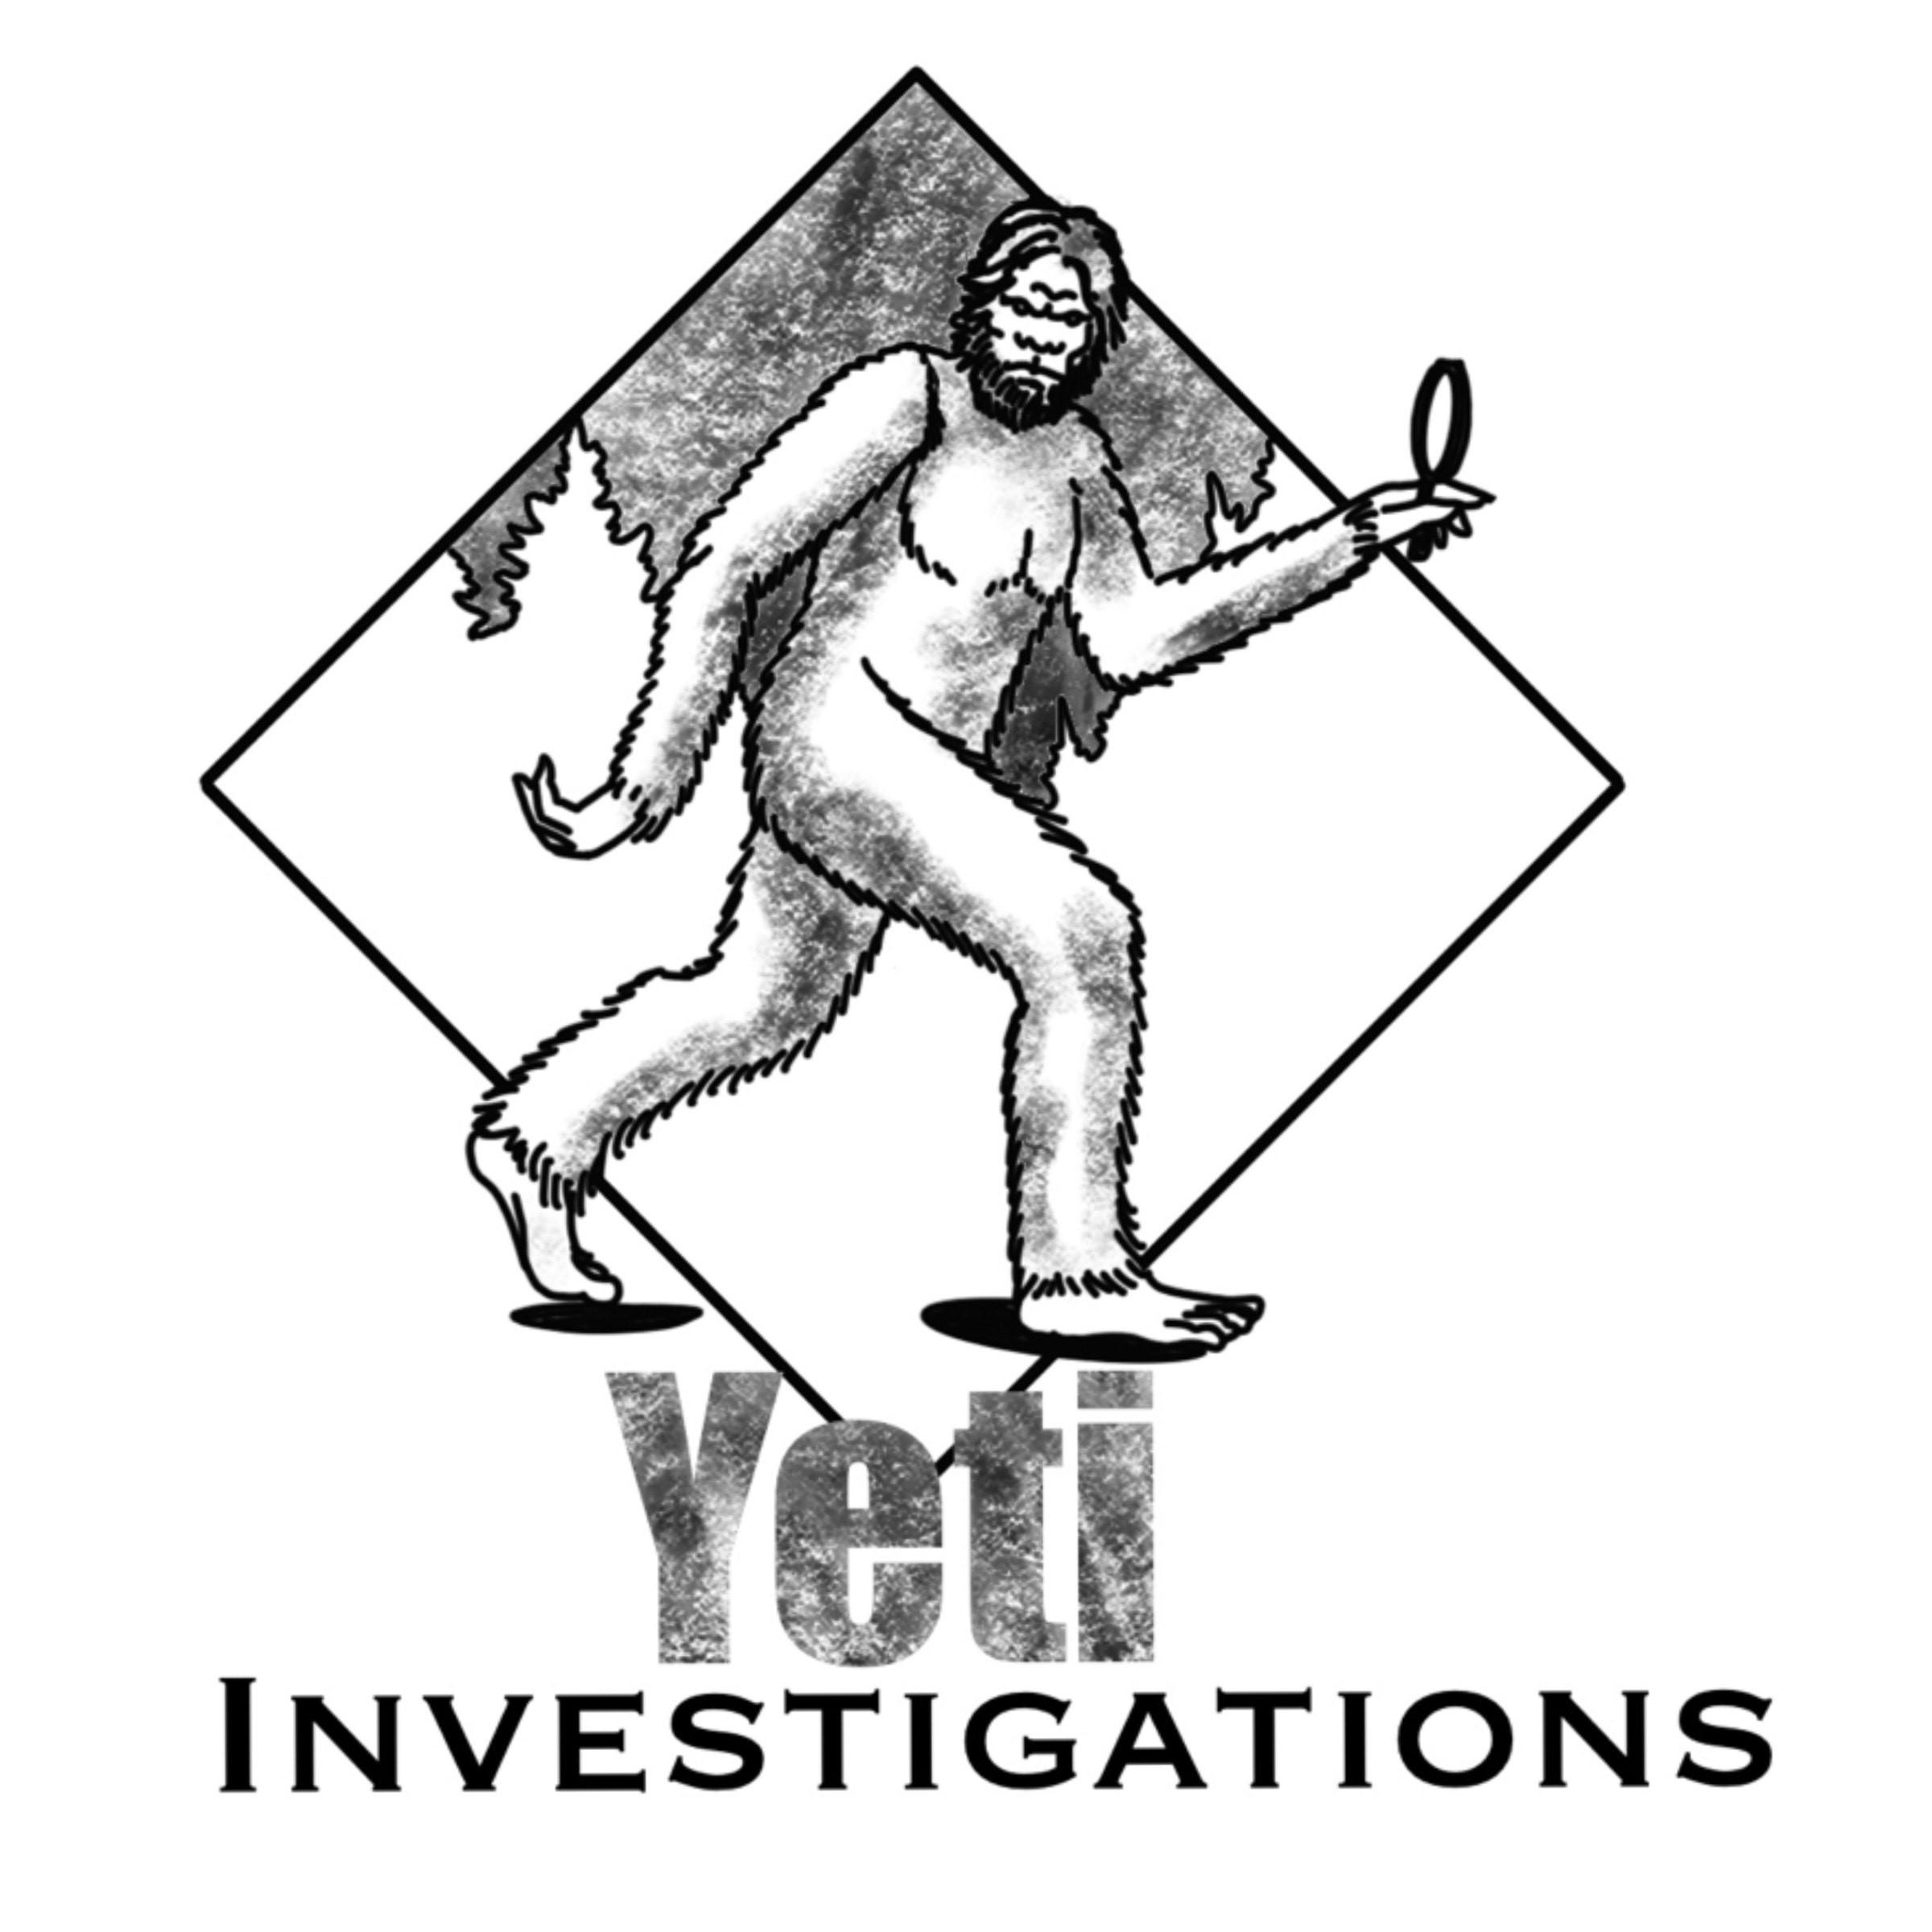 Yeti Investigations